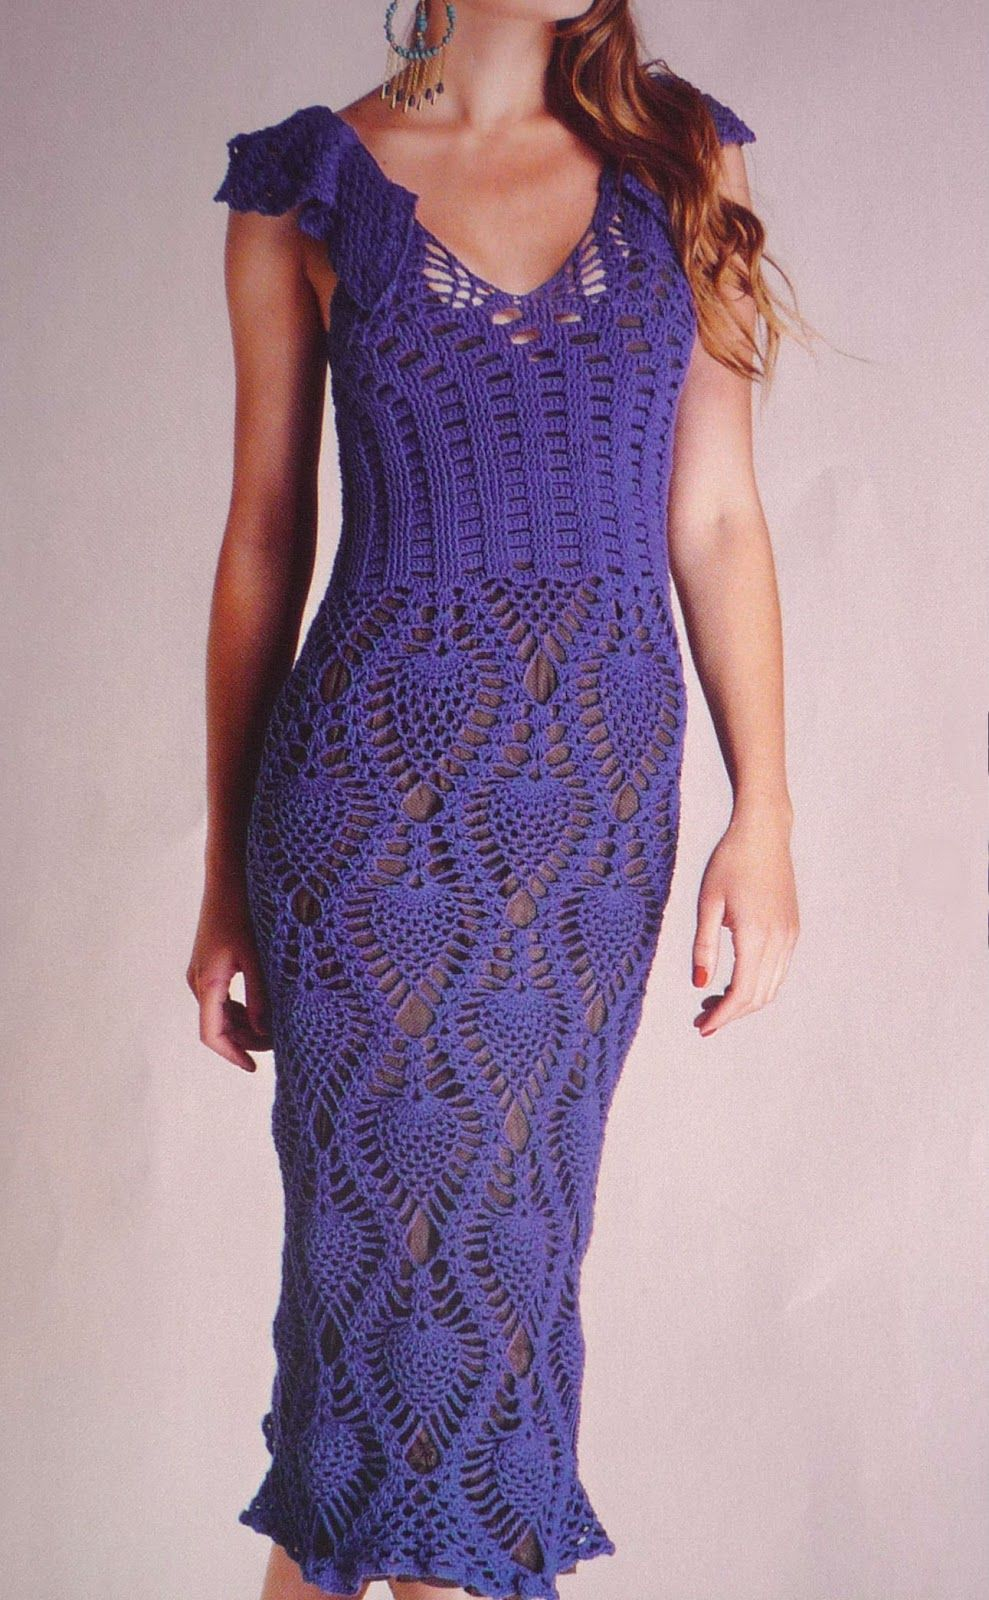 Vestido con punto piña (pineapple stitch dress) | Crochet ...